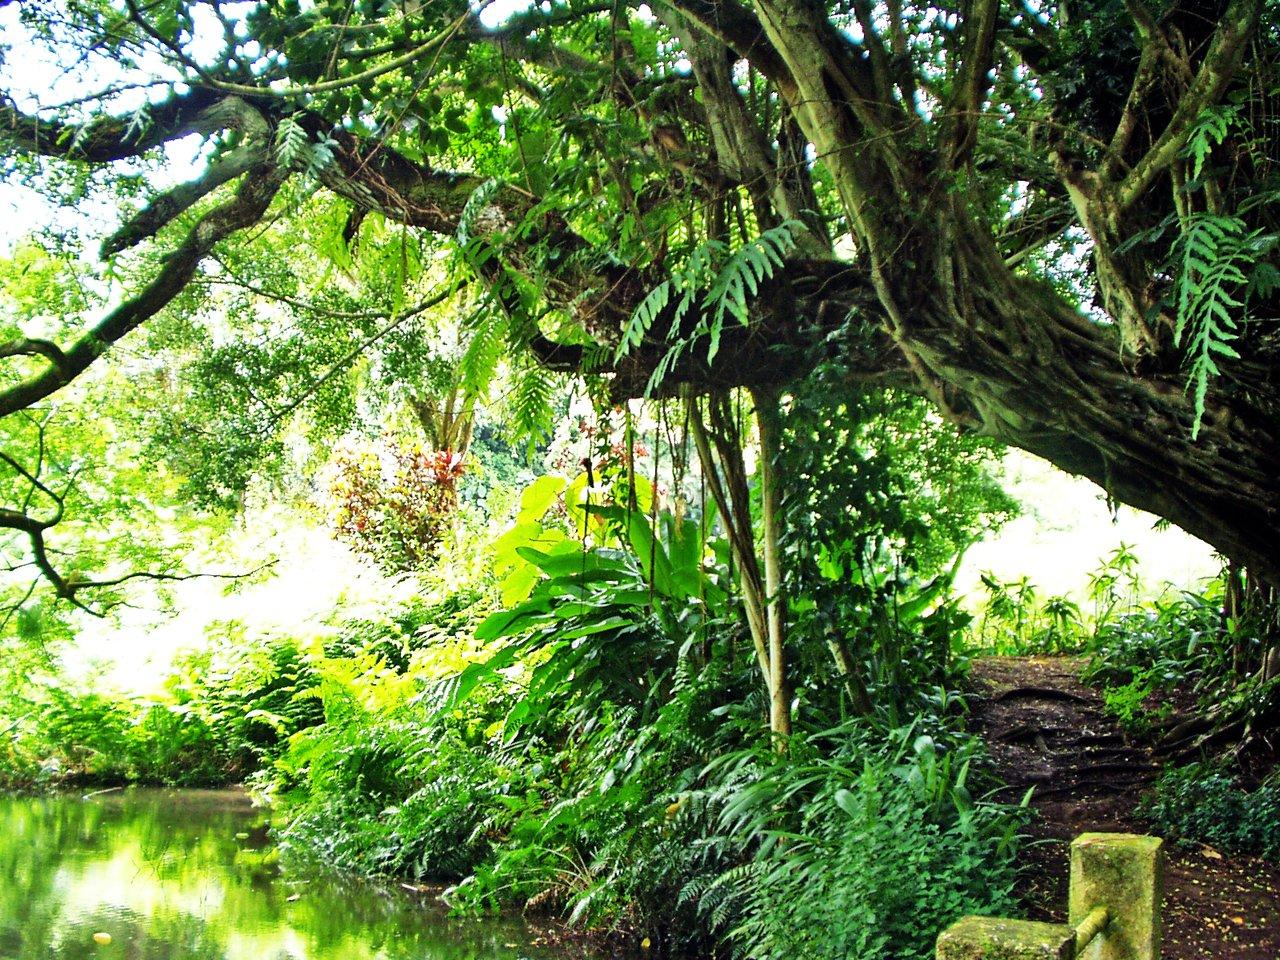 Edens garden 2